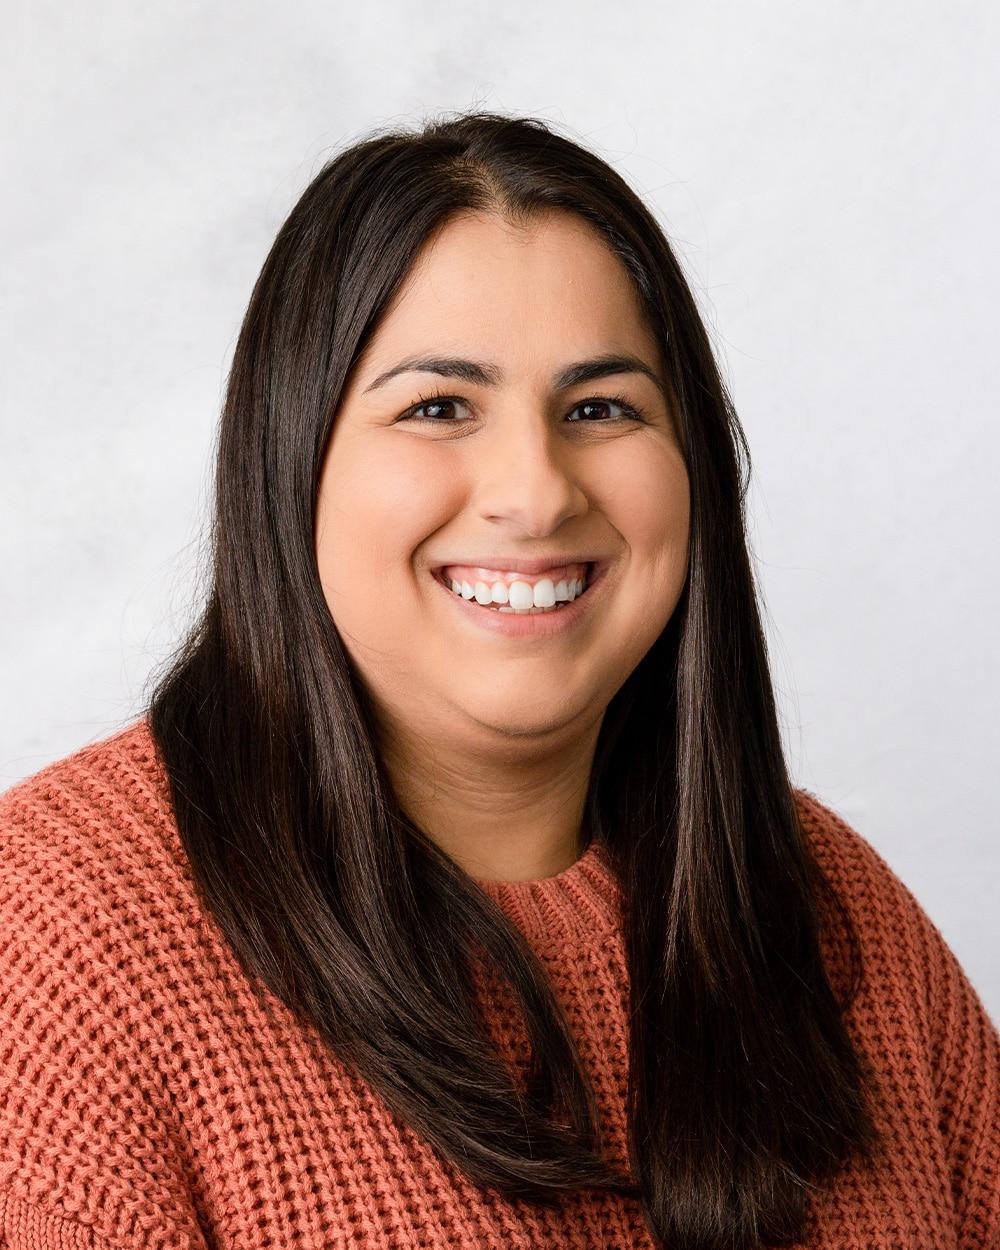 donna hassani md - Fort Worth EM Residency Program